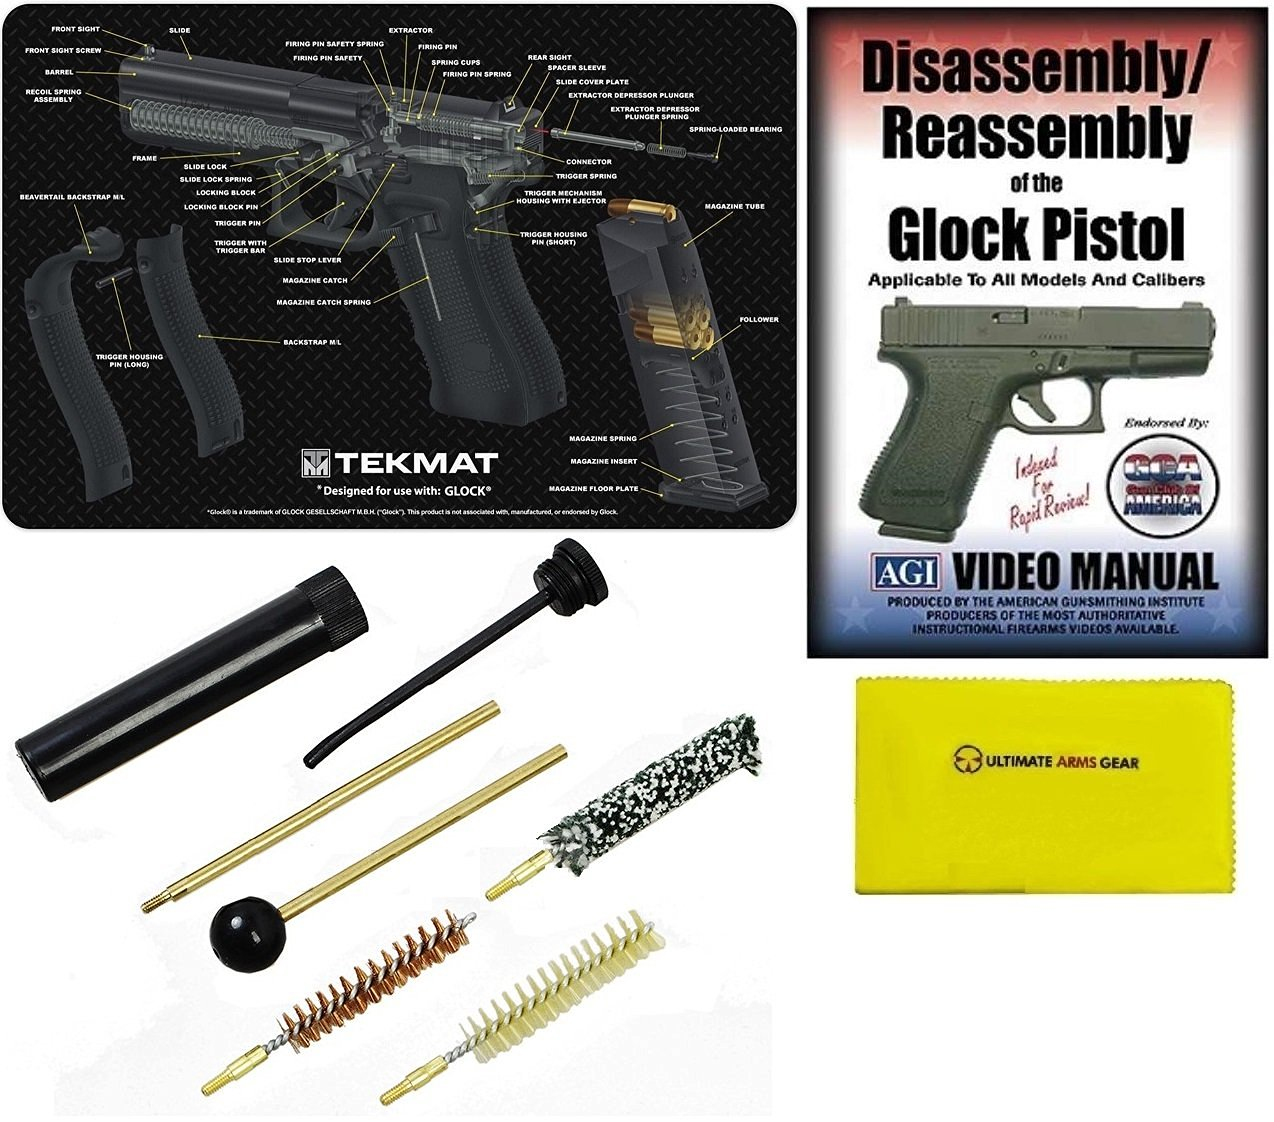 OEM Glock Disassembly Tool Punch Pistol Gun Takedown Parts Maintenance Tools